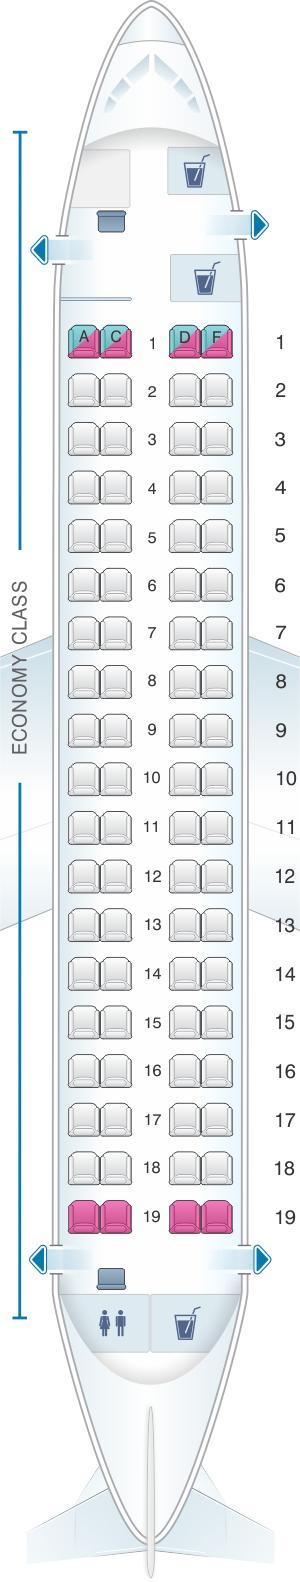 Seat map for Finnair Embraer EMB 170